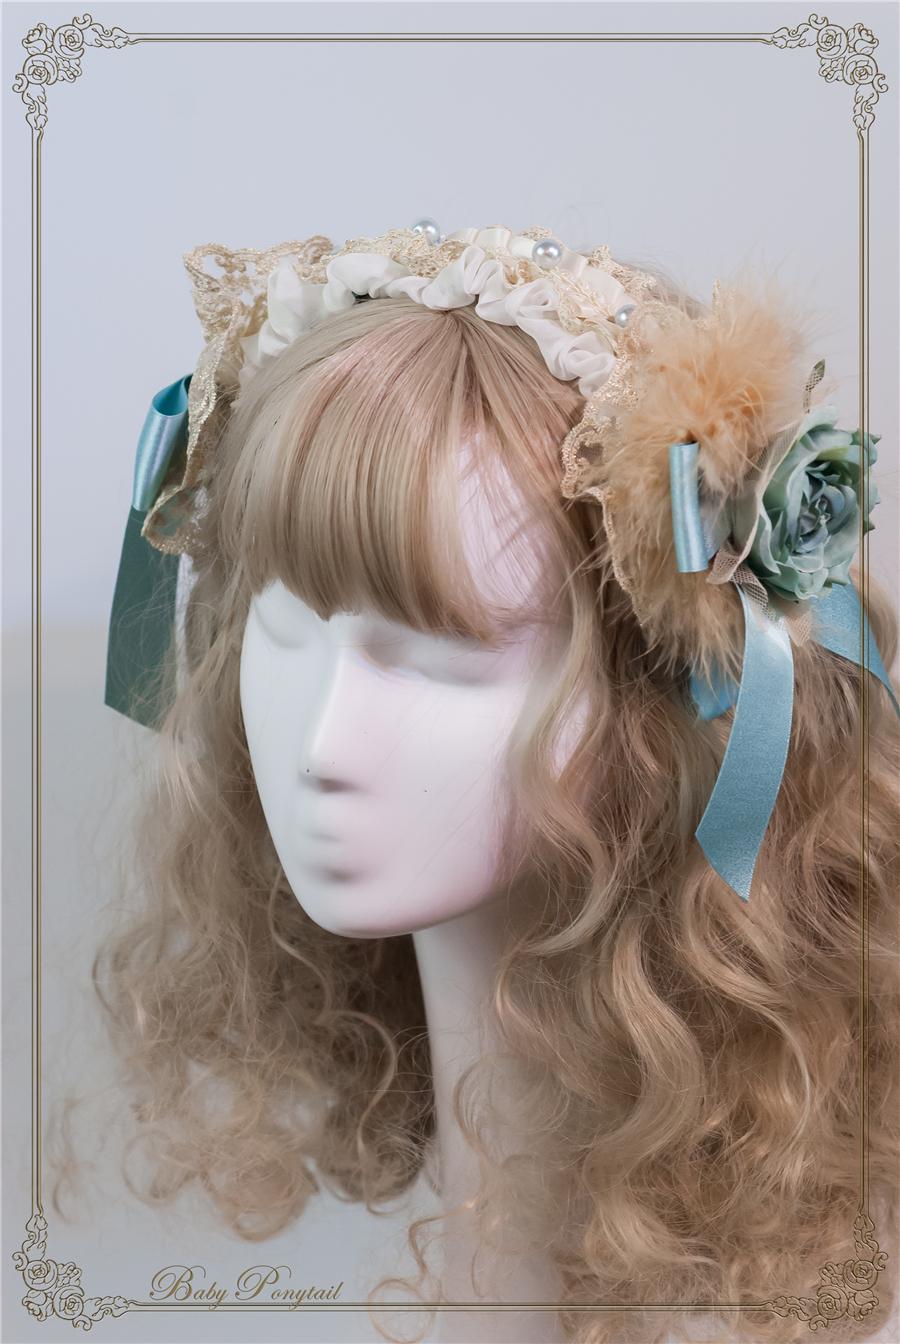 Baby Ponytail_Stock photo_Circus Princess_Rose Head Dress Sax_03.jpg